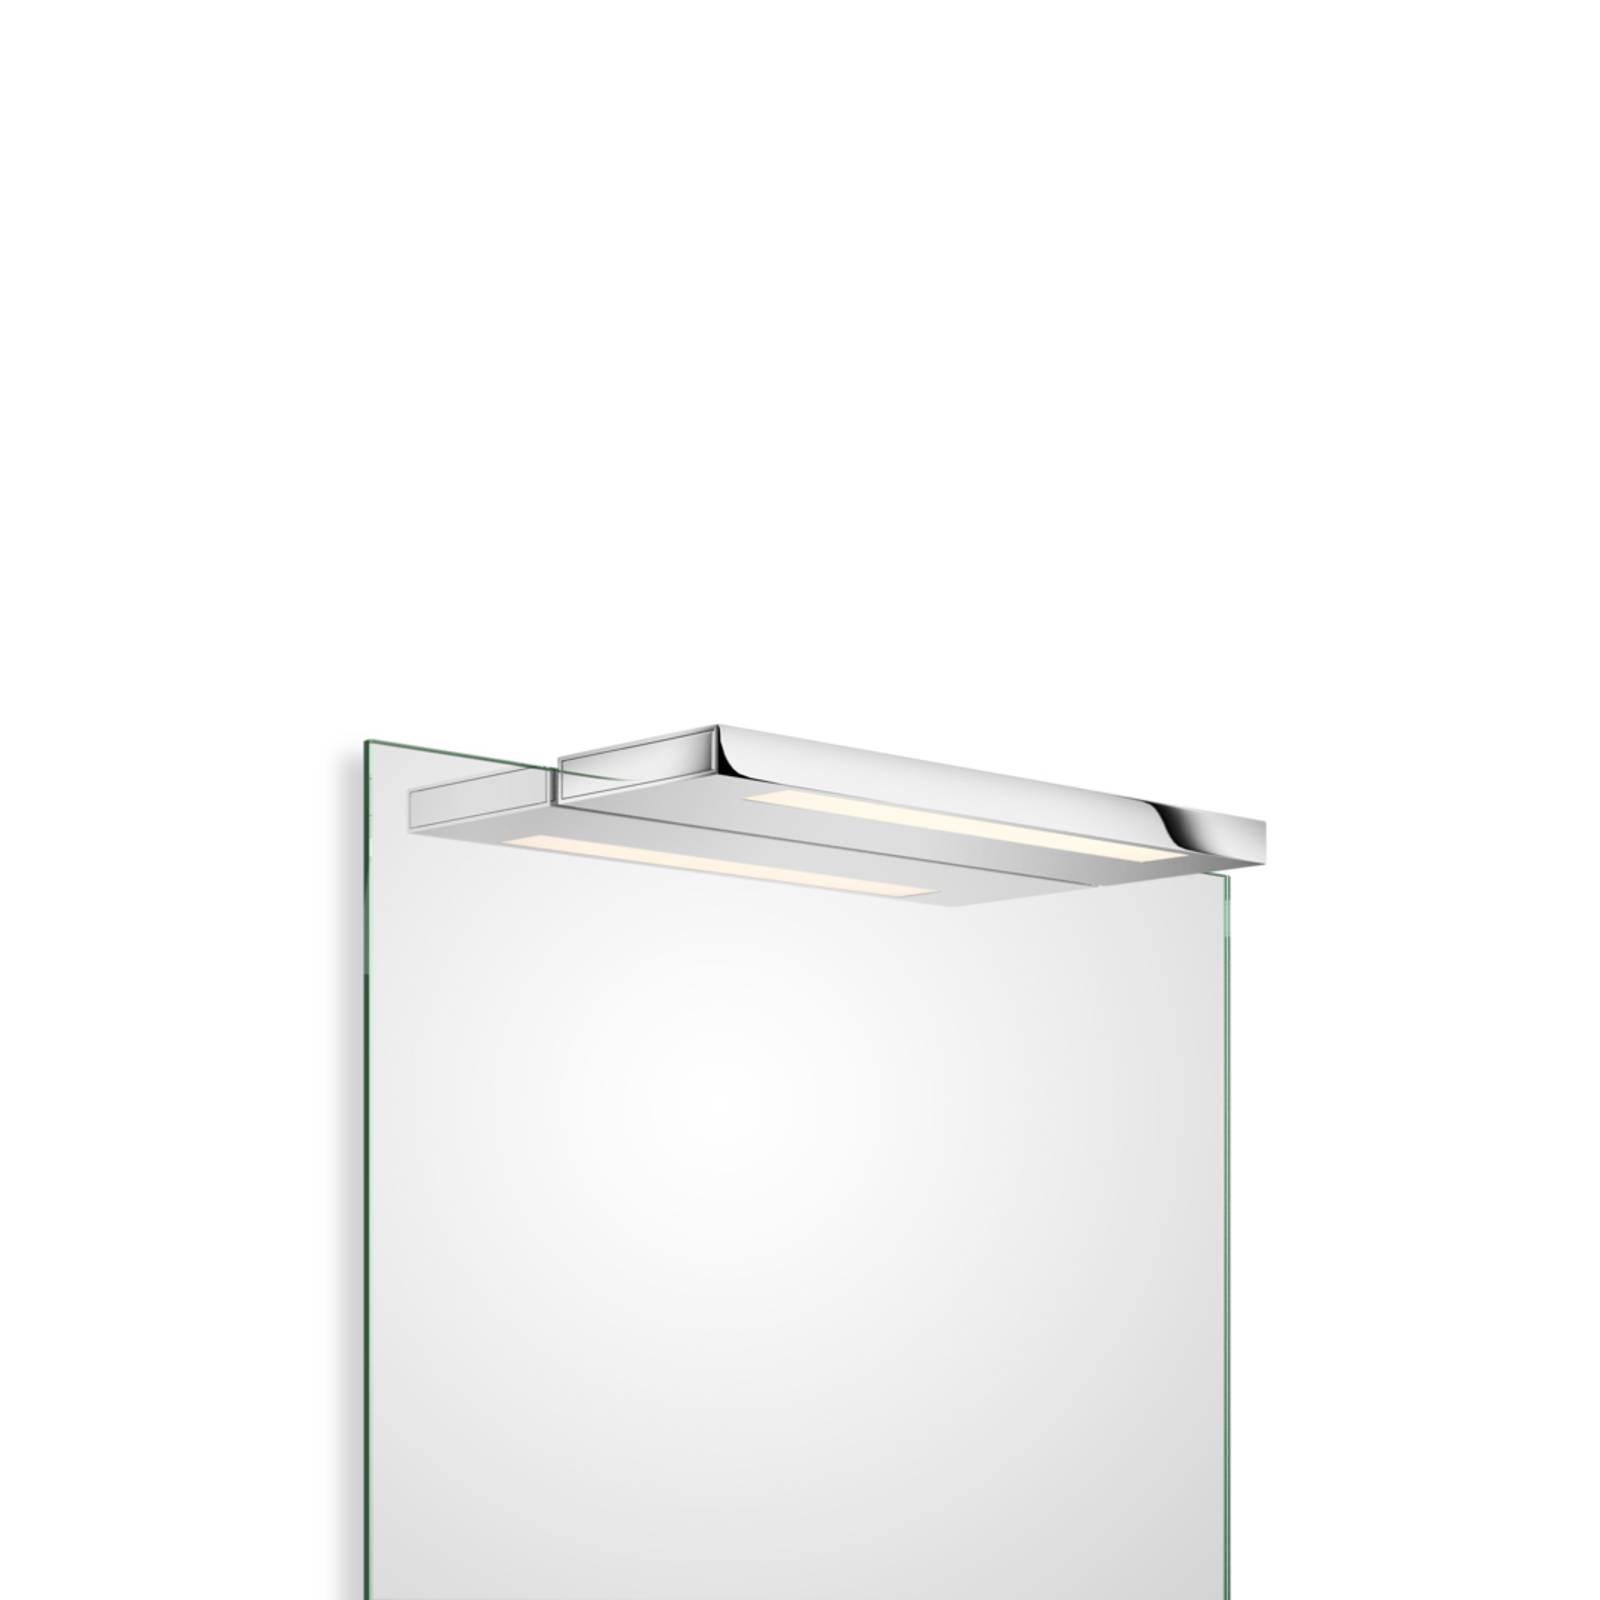 Decor Walther Slim LED-peilivalaisin kromia 34 cm